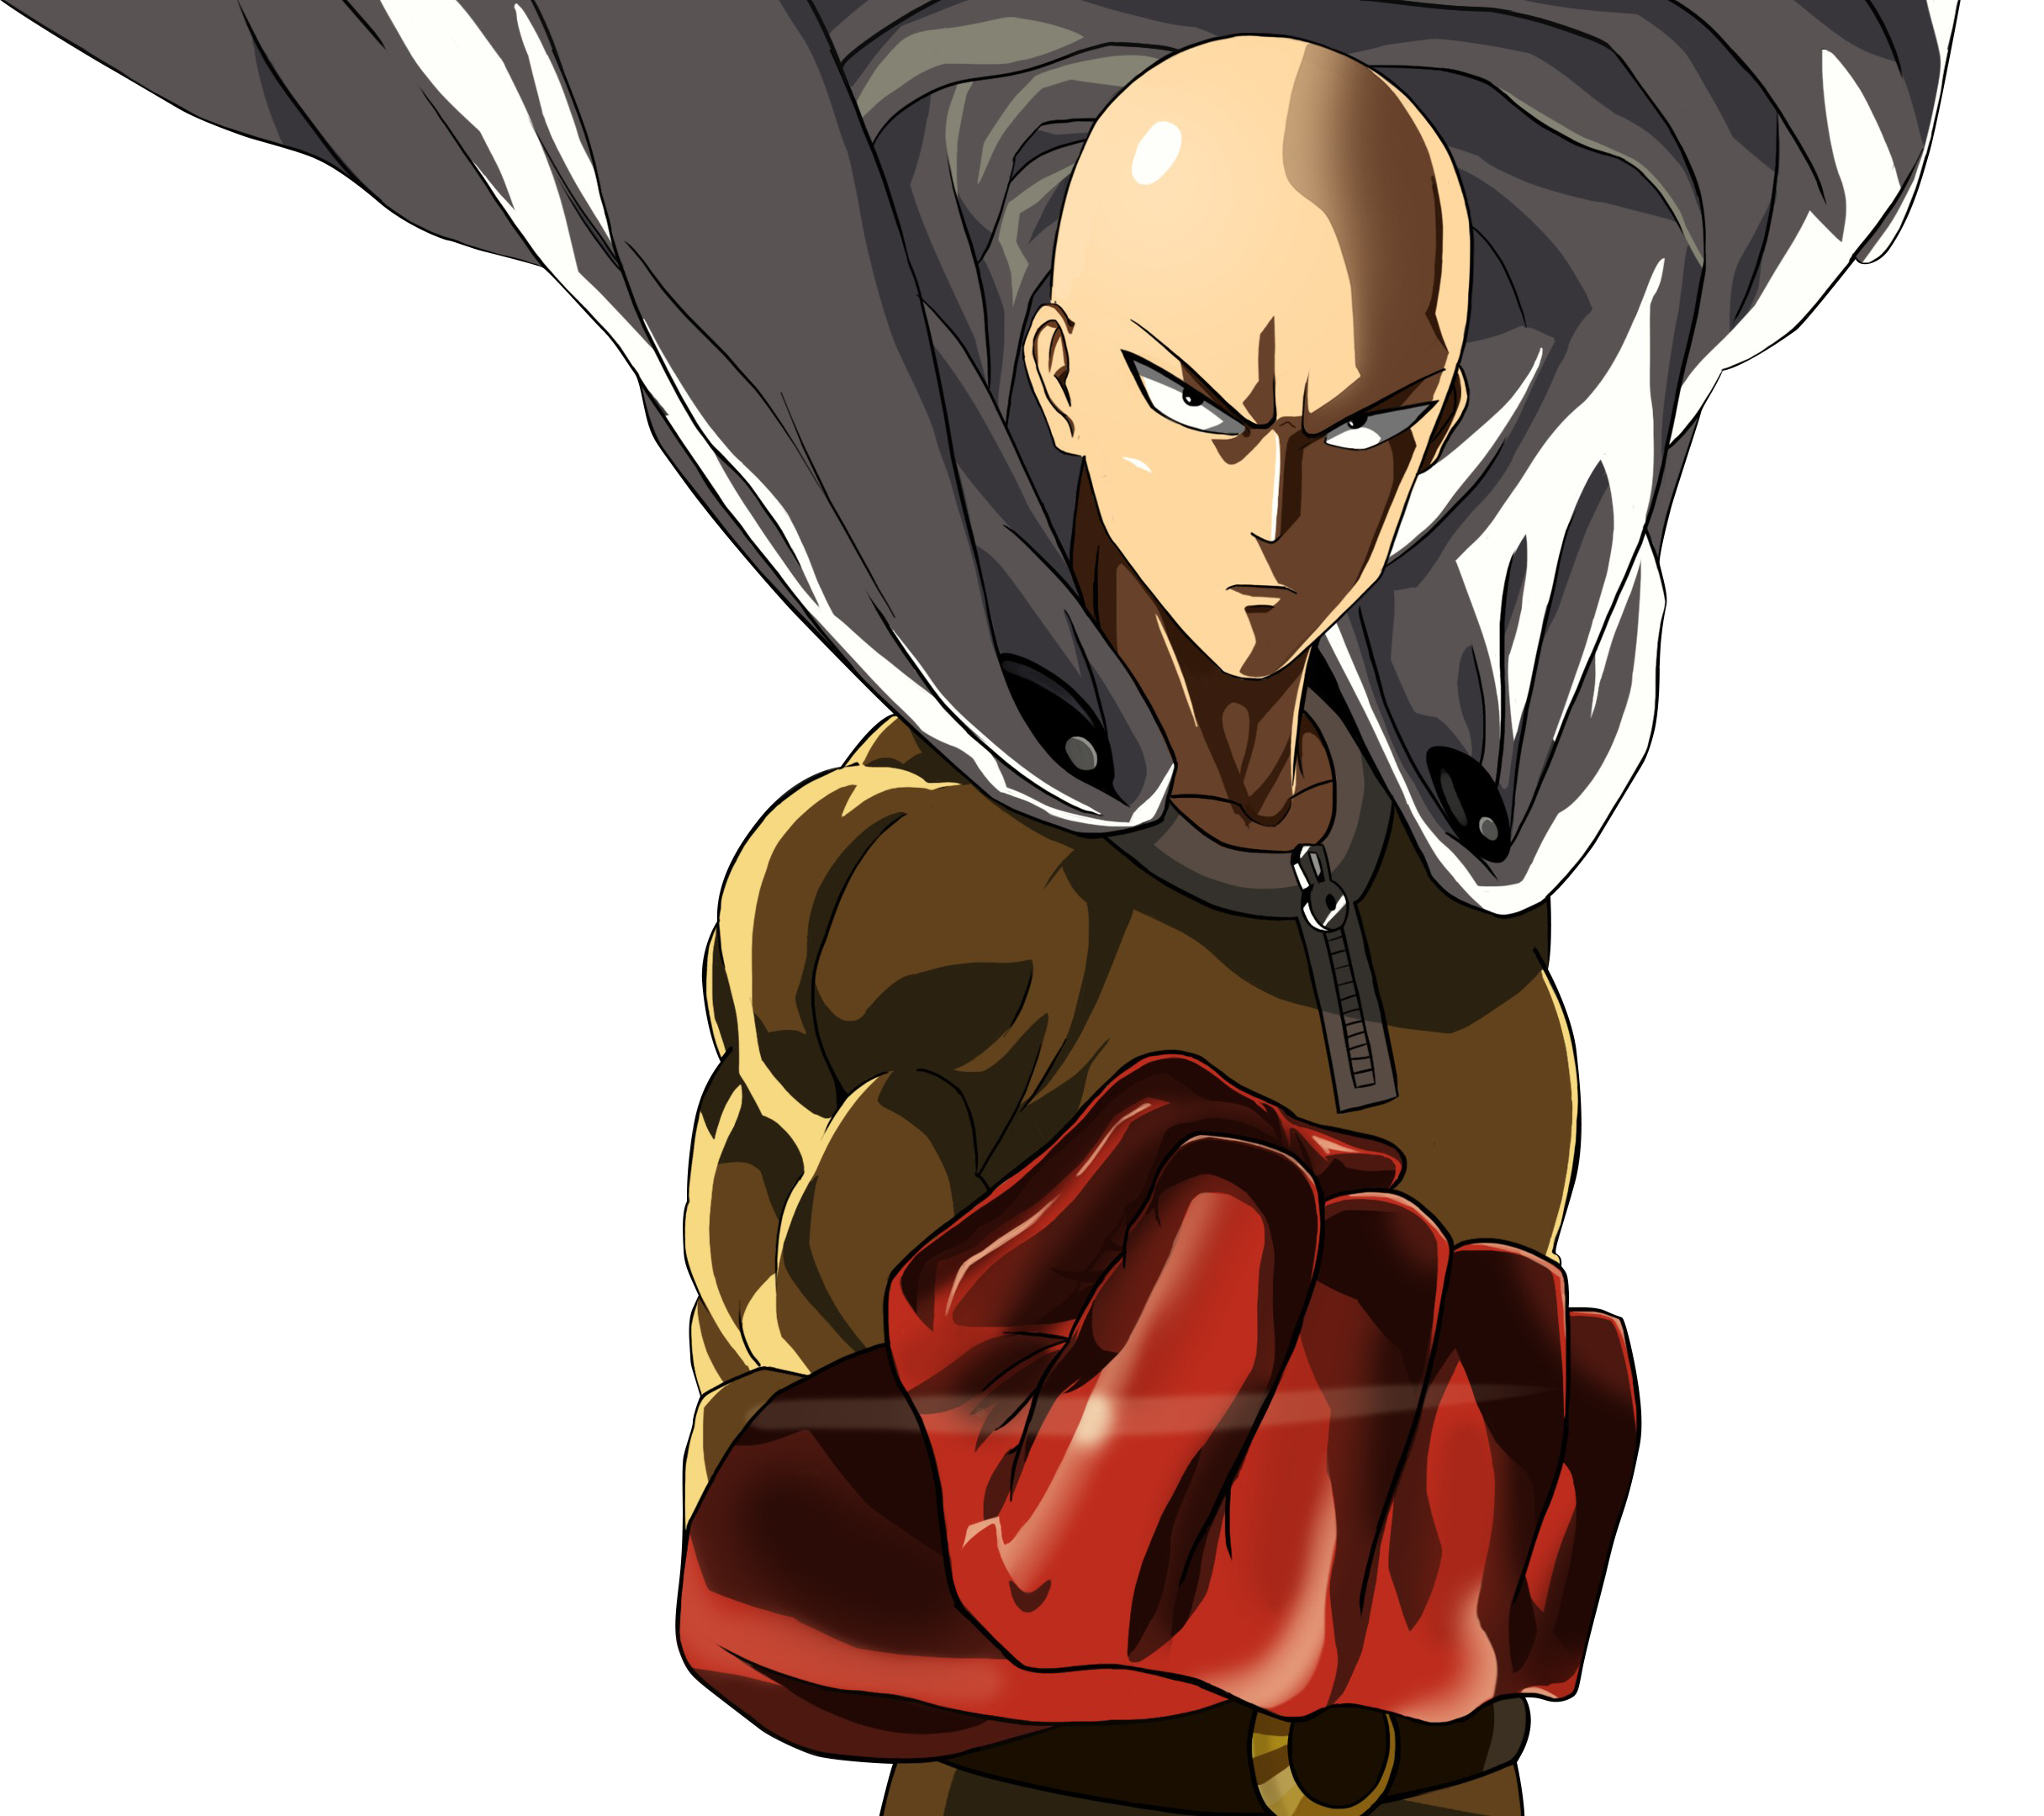 661649 Png 2431 2160 Saitama Punch Man Anime